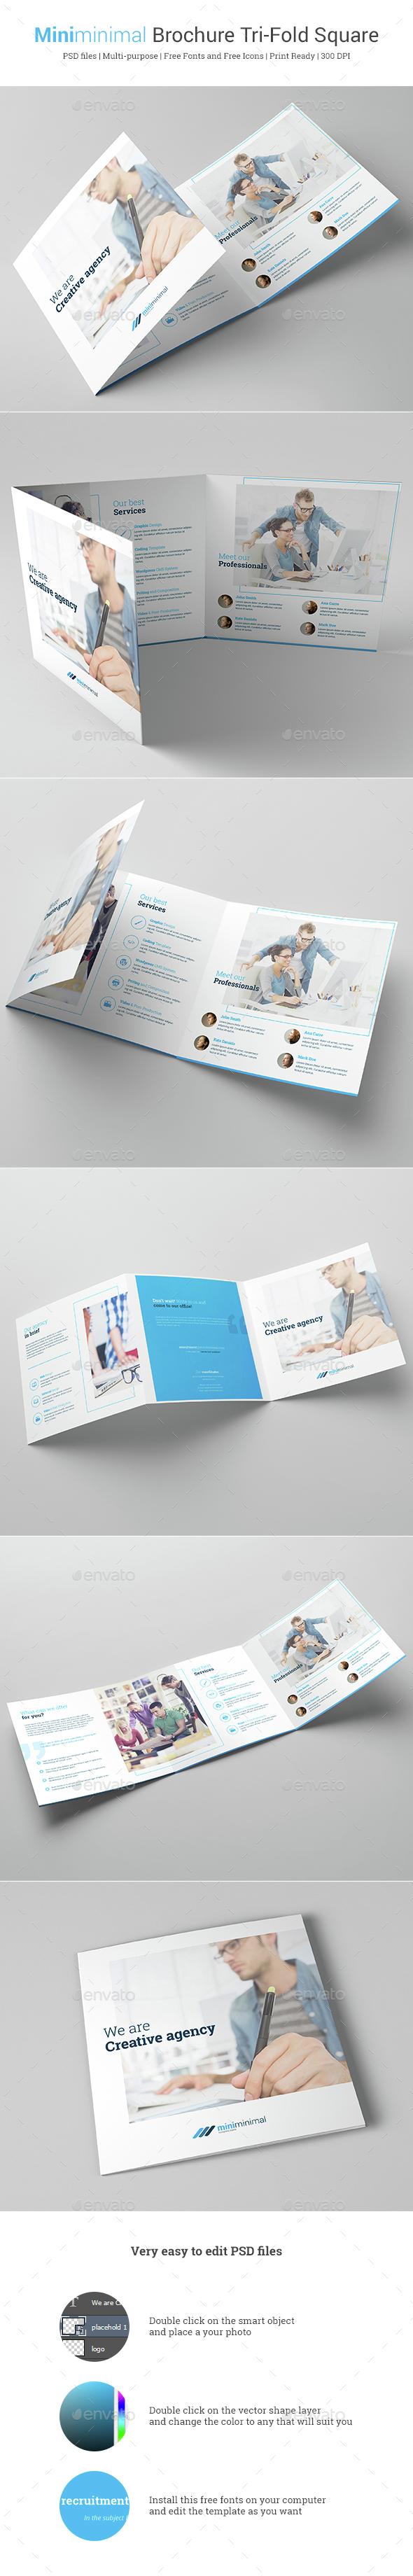 Miniminimal Brochure Tri-Fold Square - Brochures Print Templates